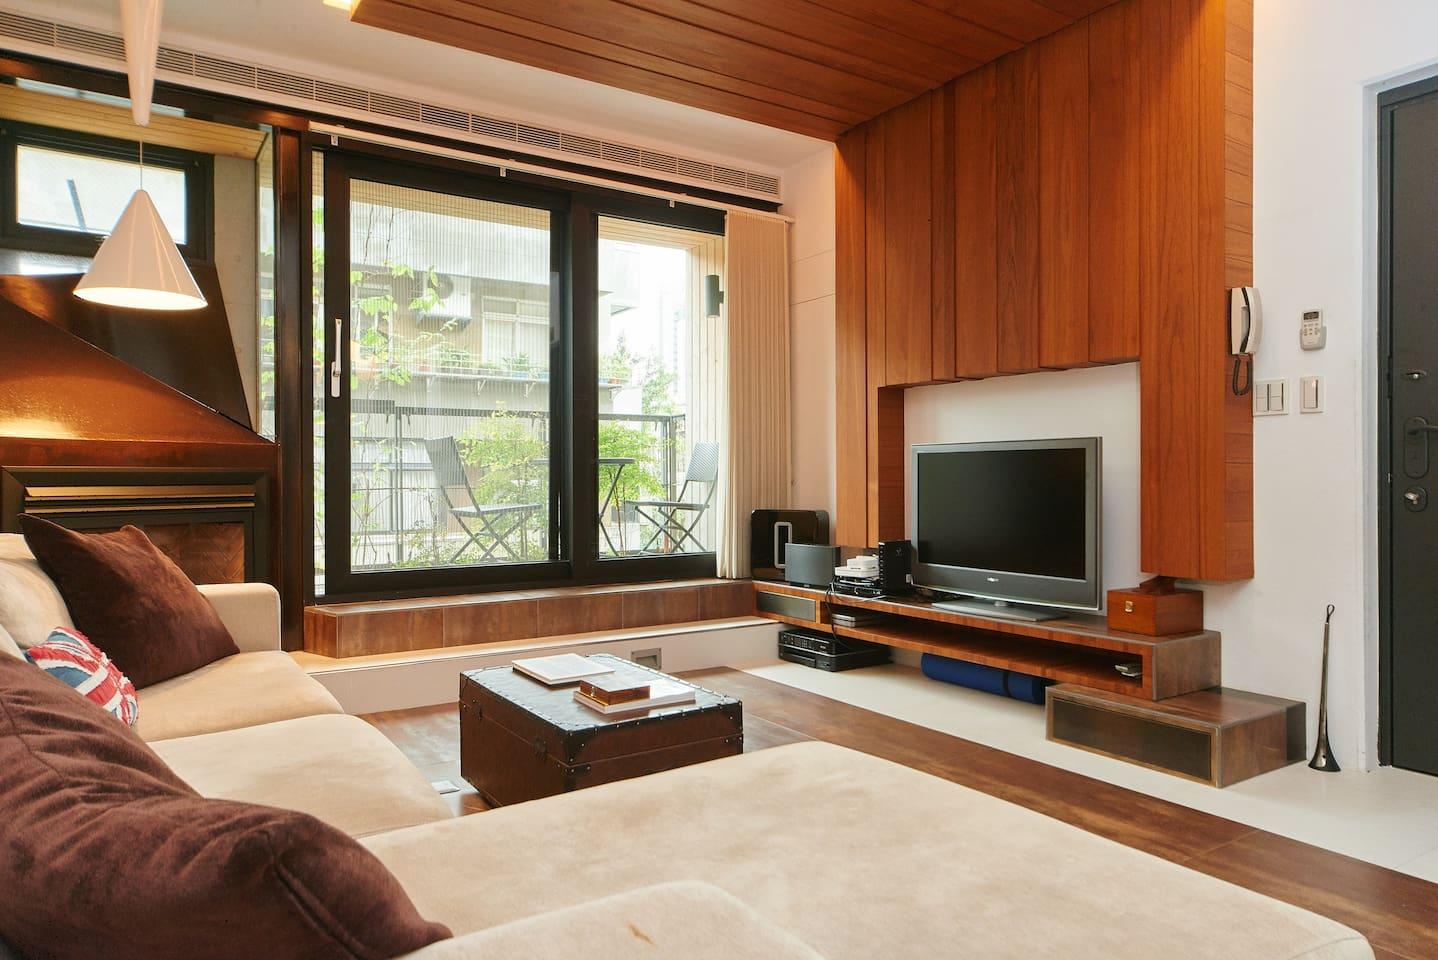 Main Room - Sitting Area